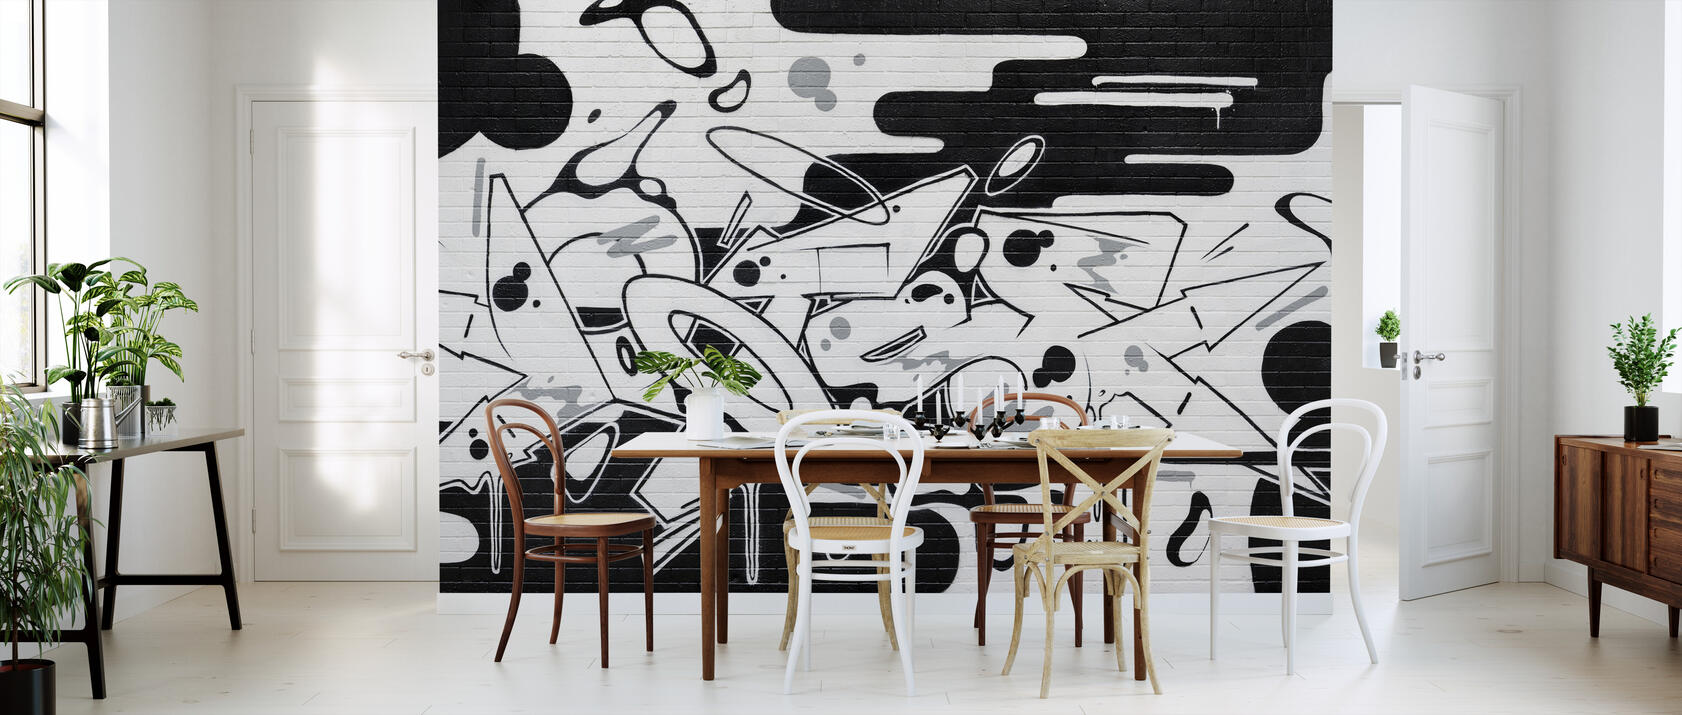 dotse trendige fototapete photowall. Black Bedroom Furniture Sets. Home Design Ideas